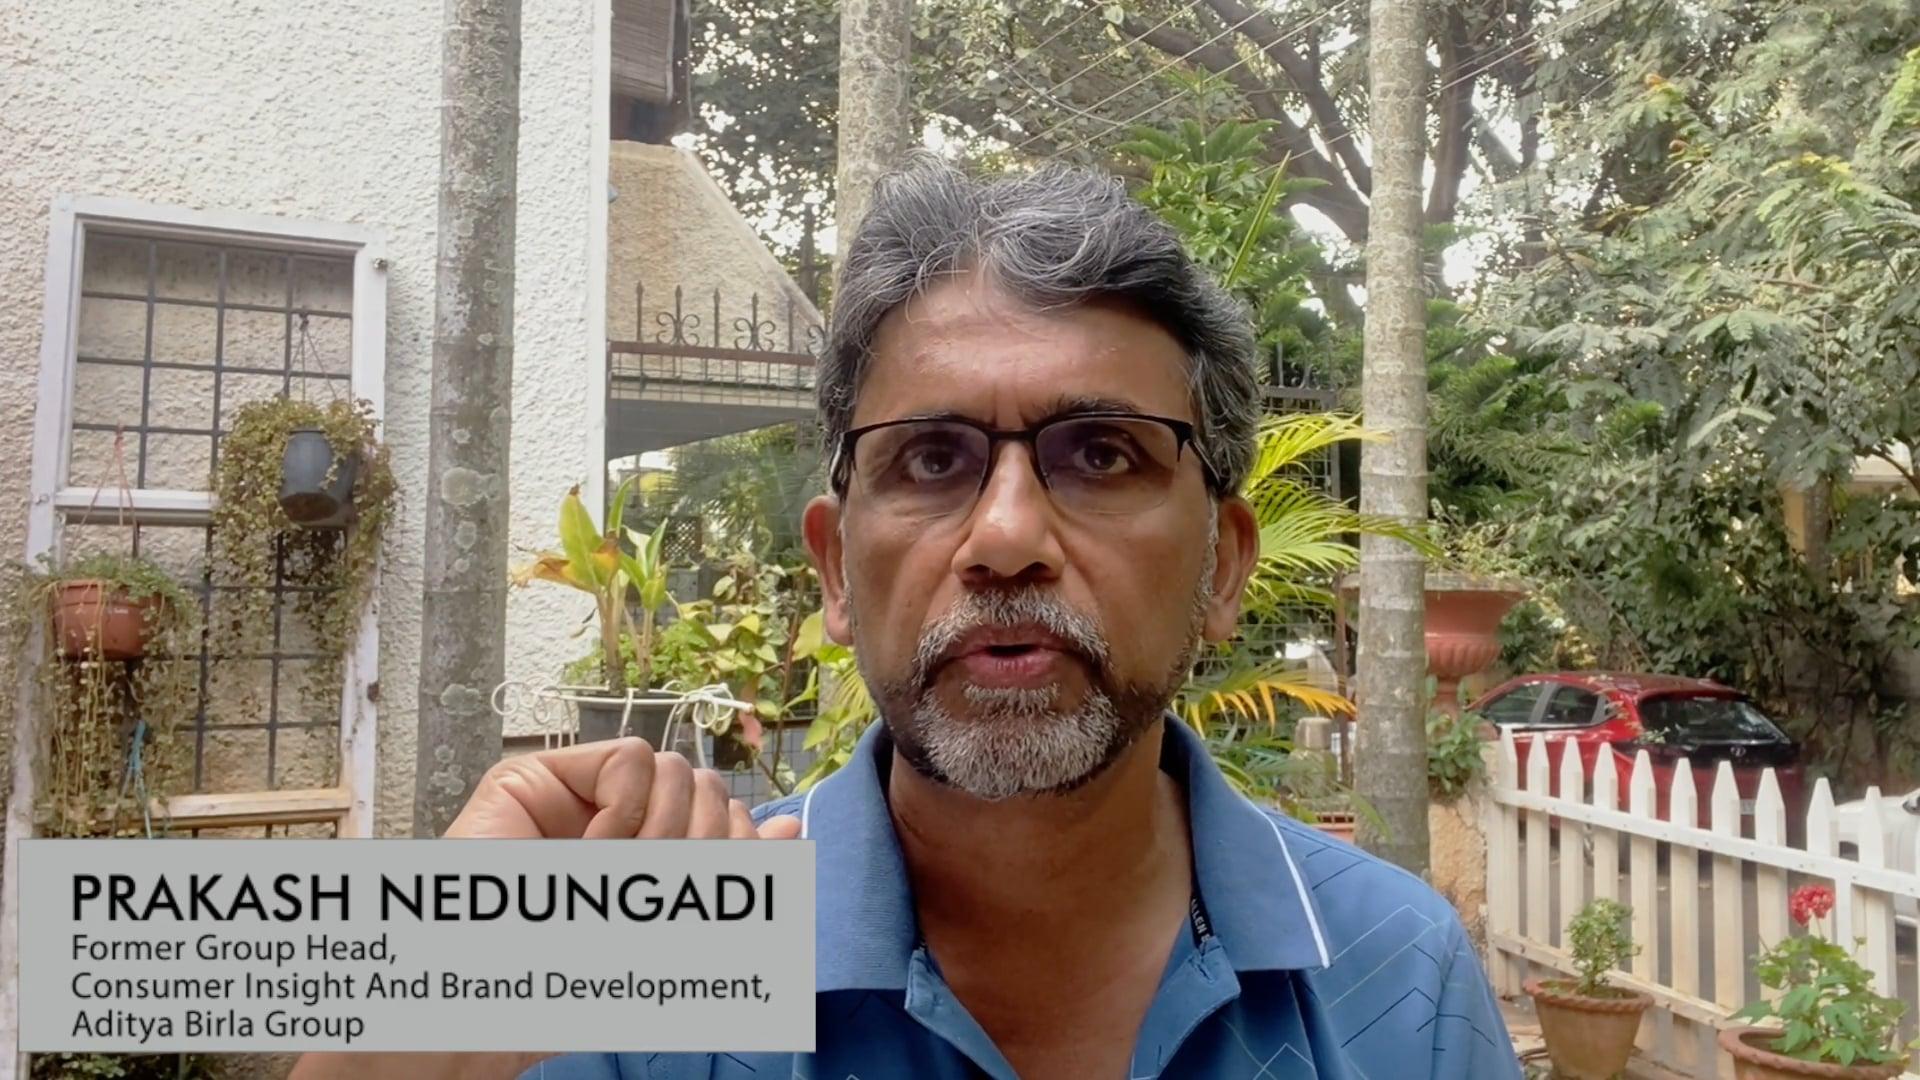 Prakash Nedungadi on 'The Right Choice' book